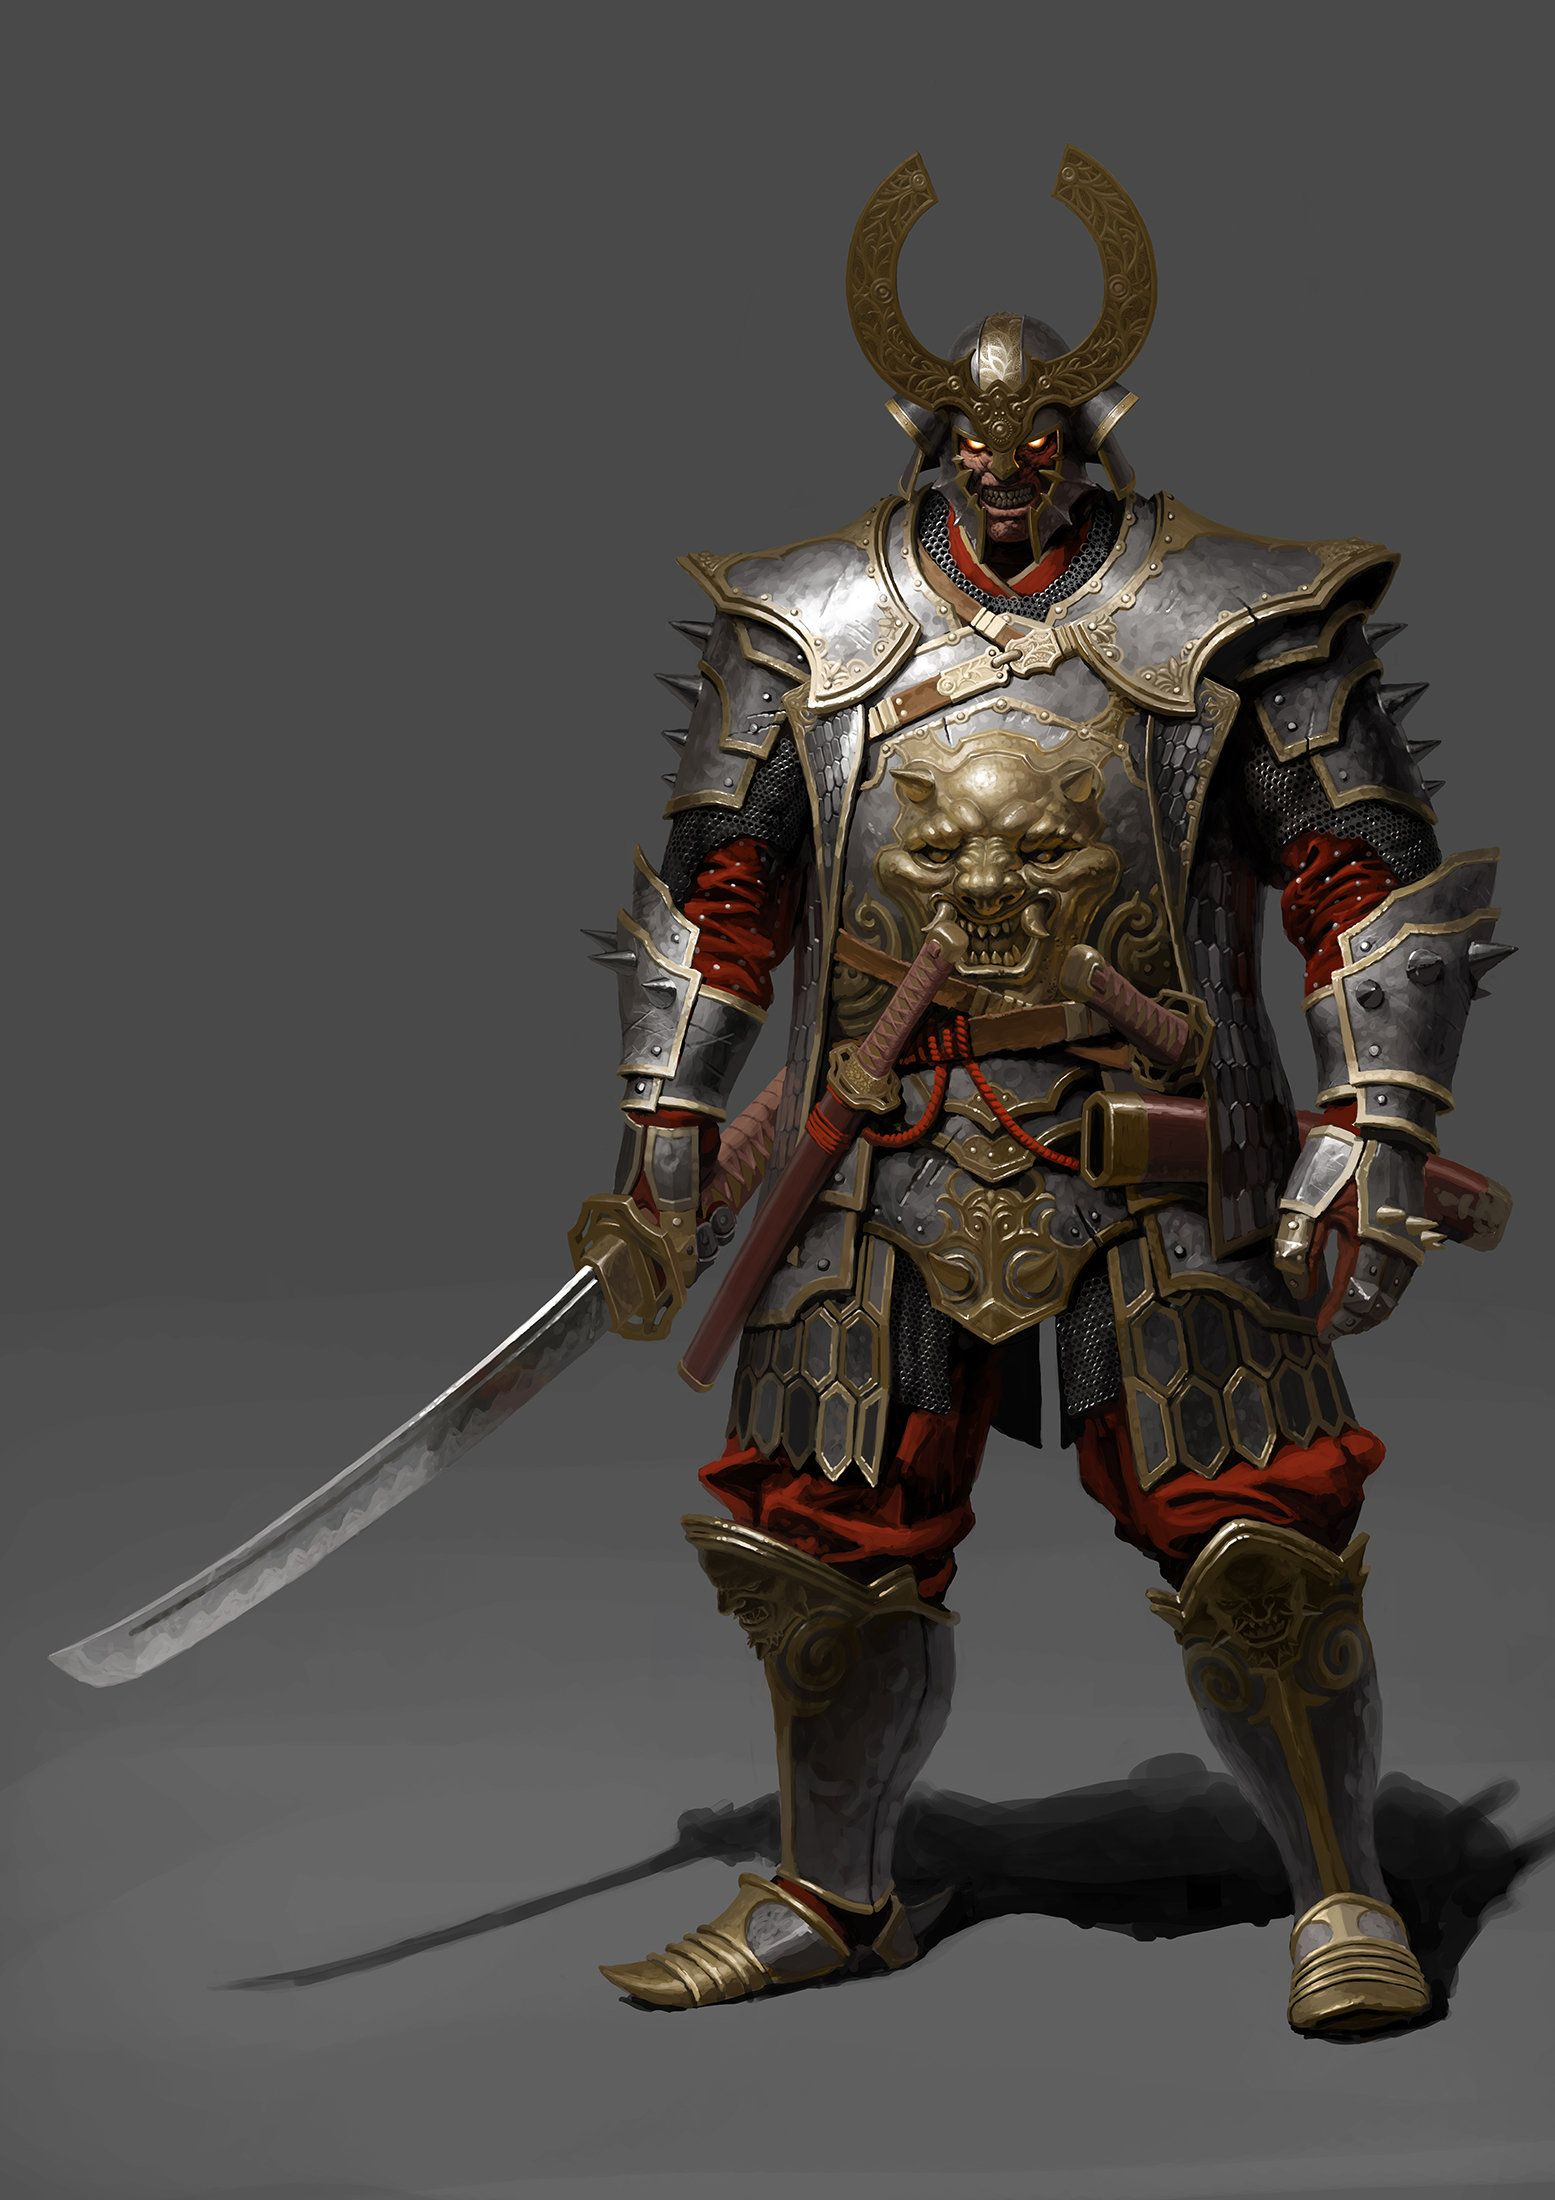 Samurai , Evgeniy Petlya on ArtStation at https://www